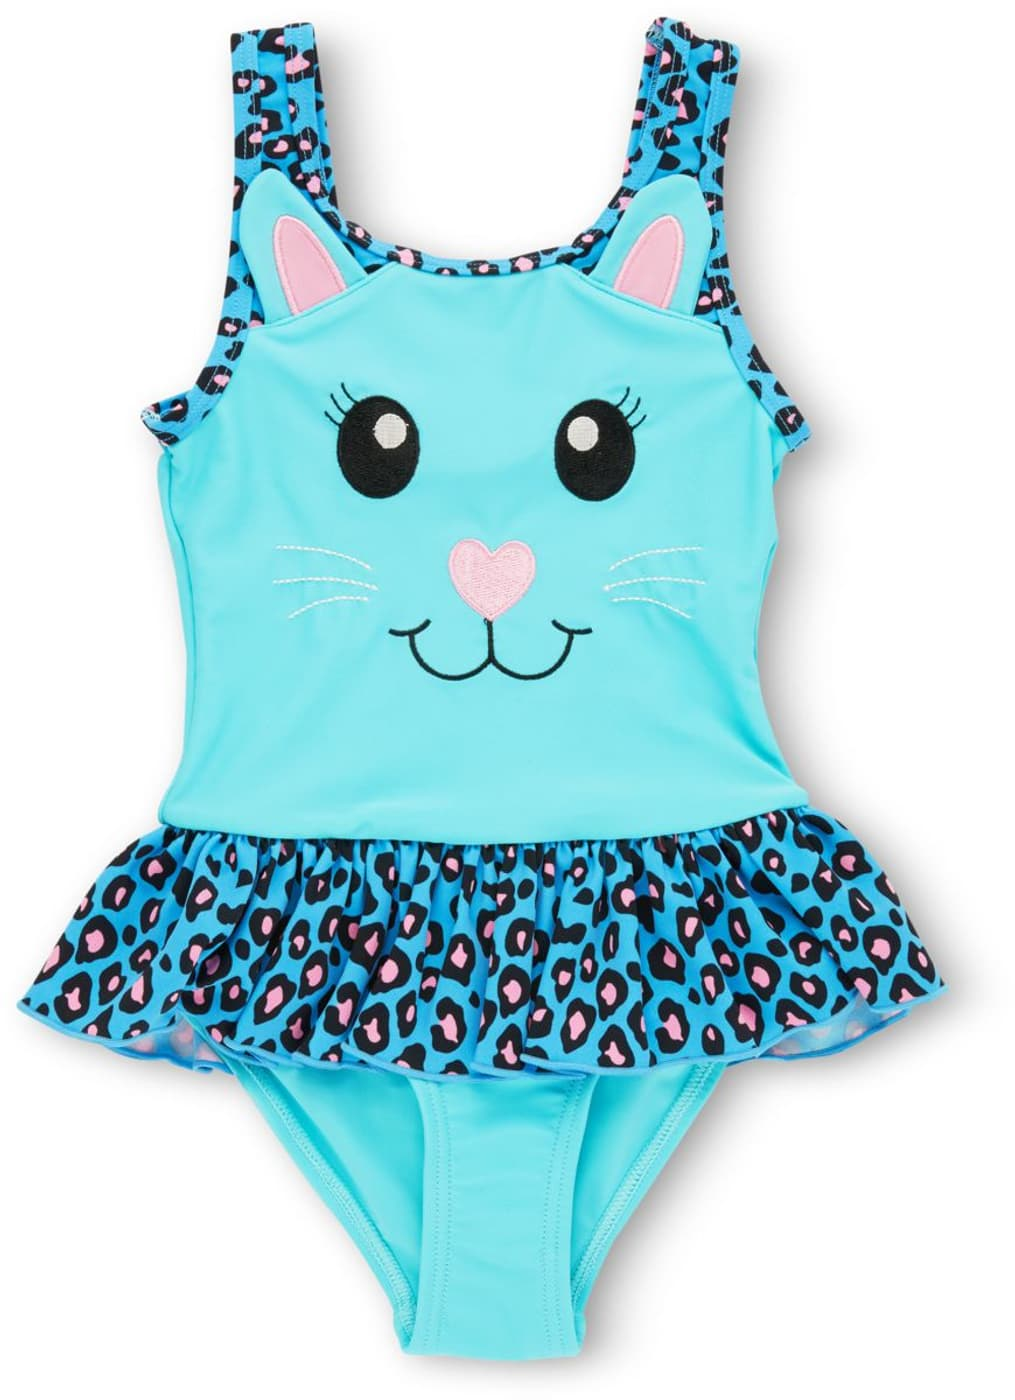 e93a1a32473c Costume da bagno per bambina turchese | Migros